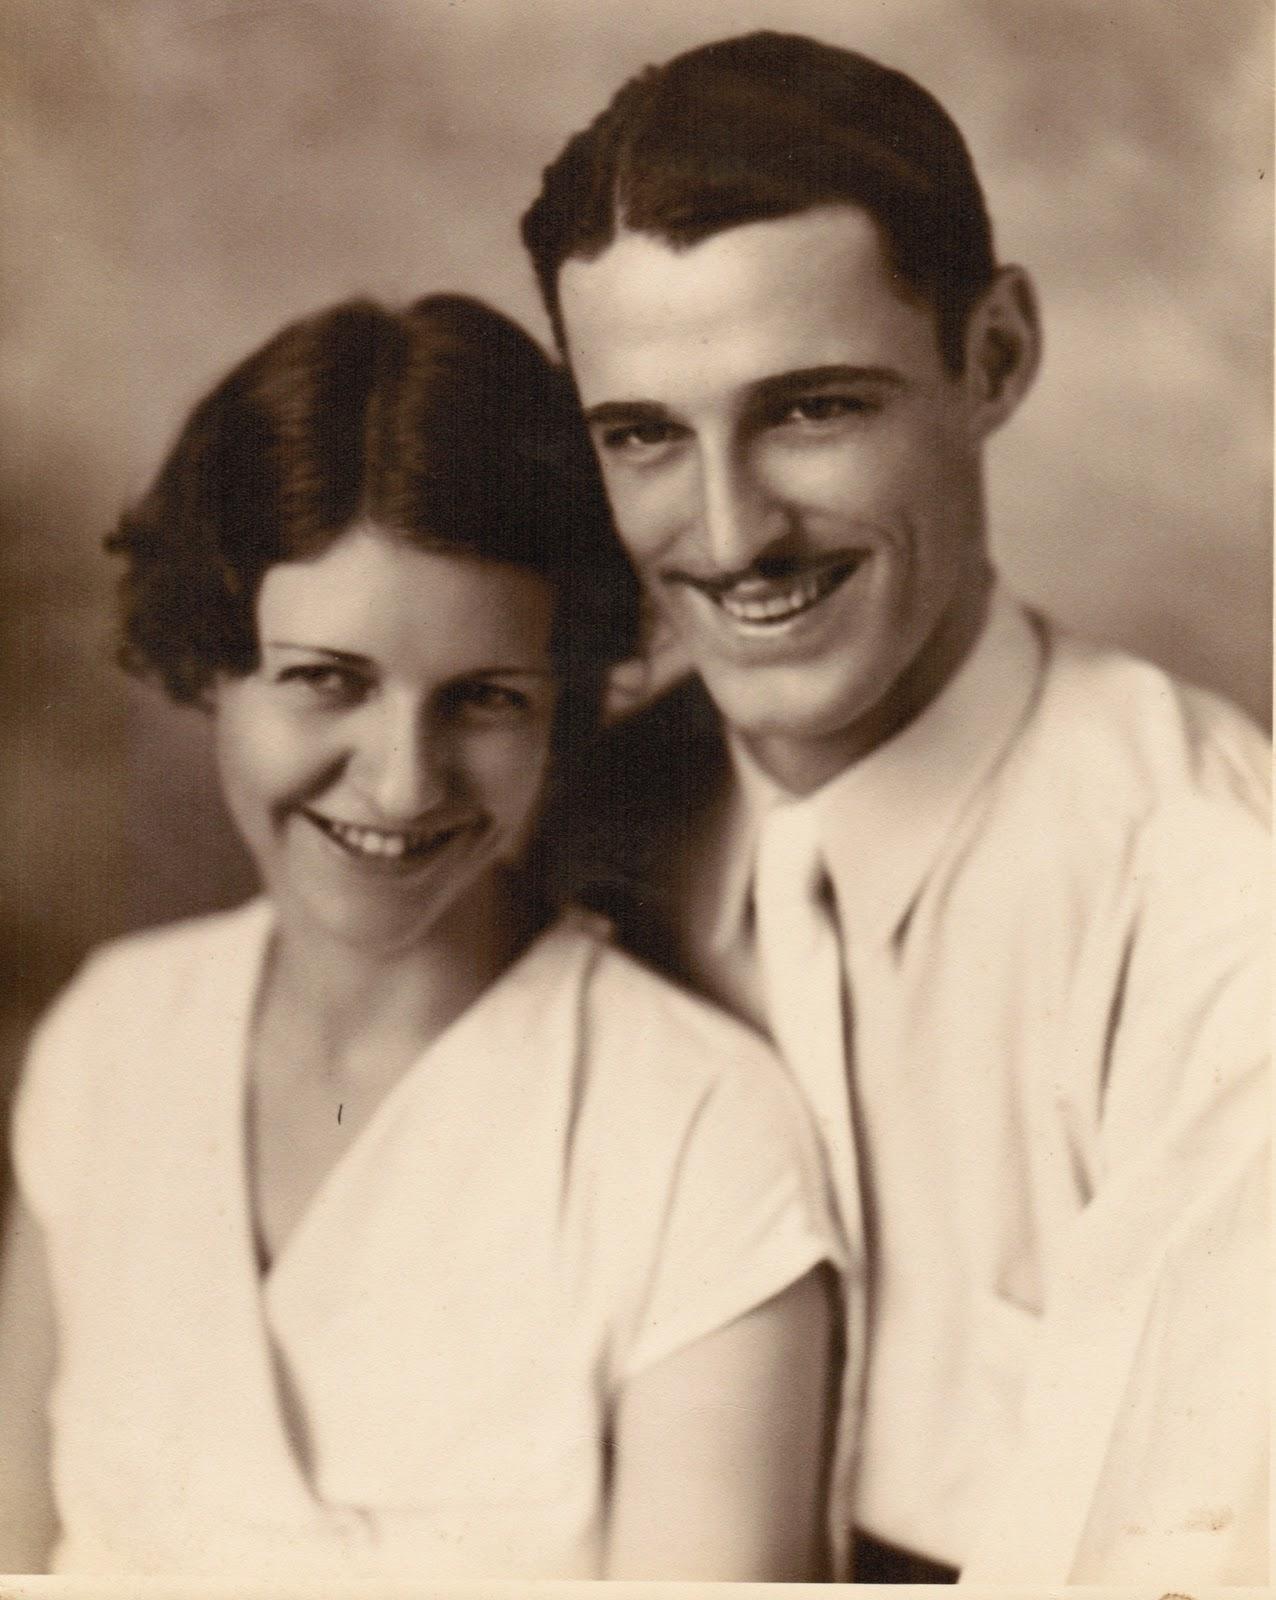 Pat & Lois Murphy